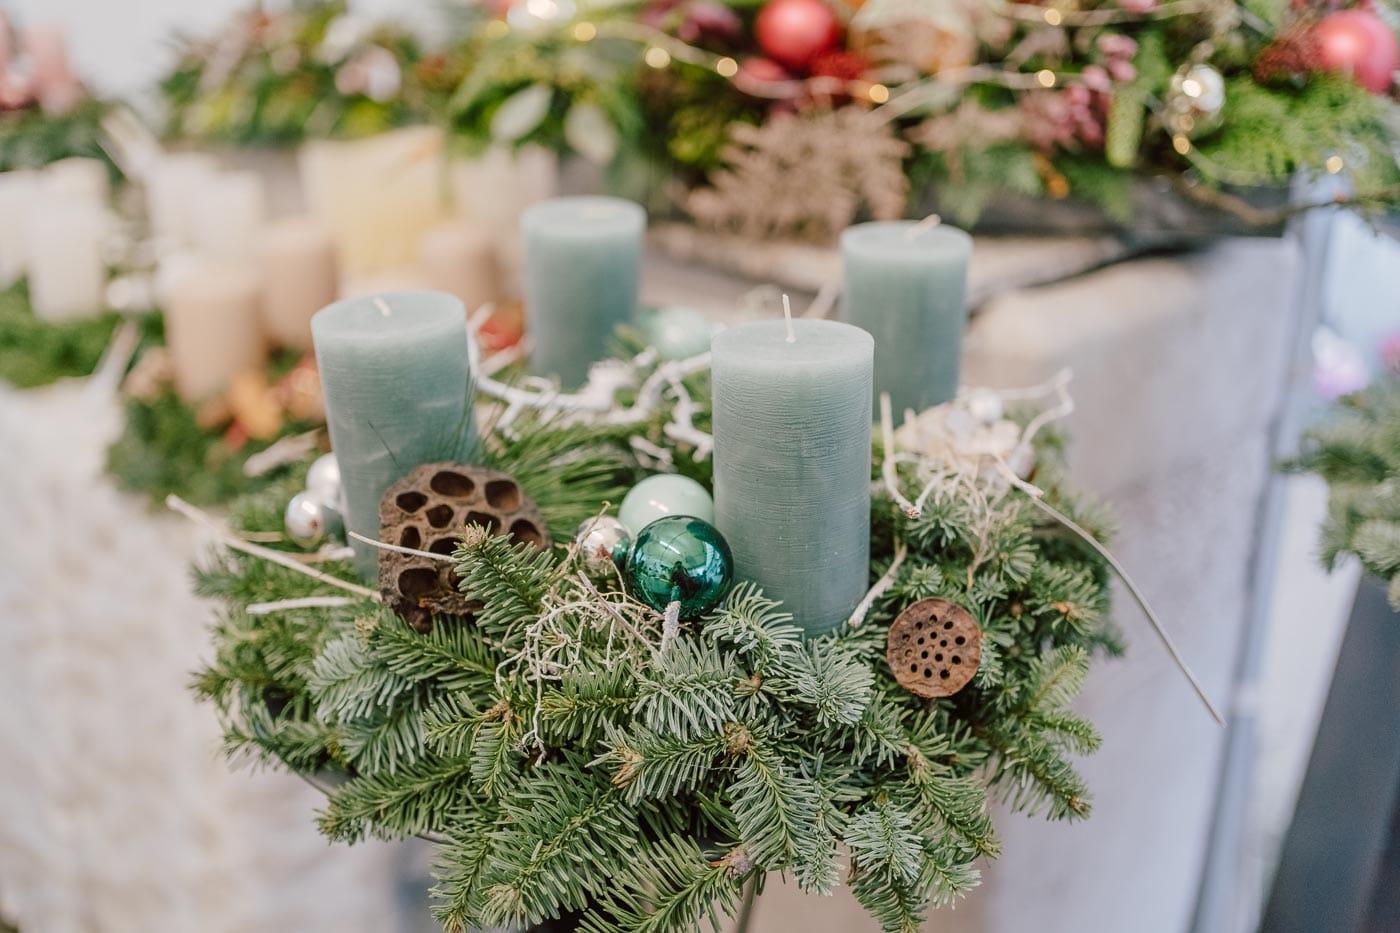 blumen-gaby-strohmeier-graz-saisonales-advent-17